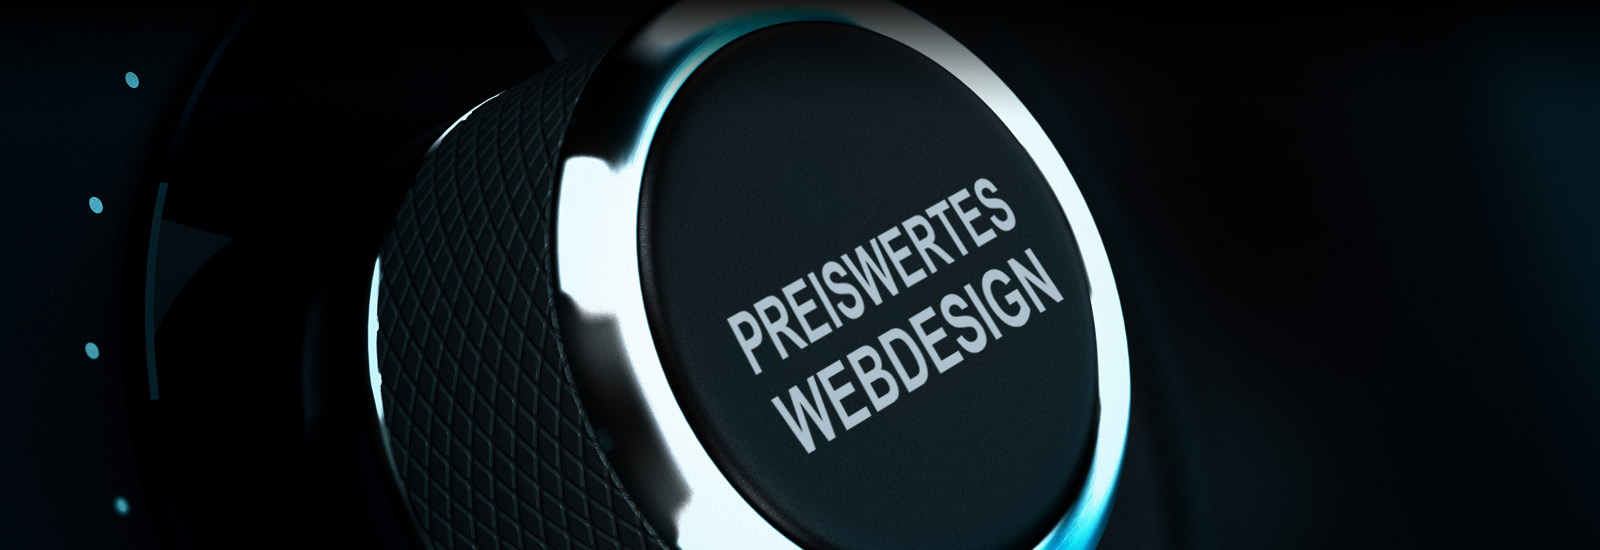 Webdesign Agentur slider